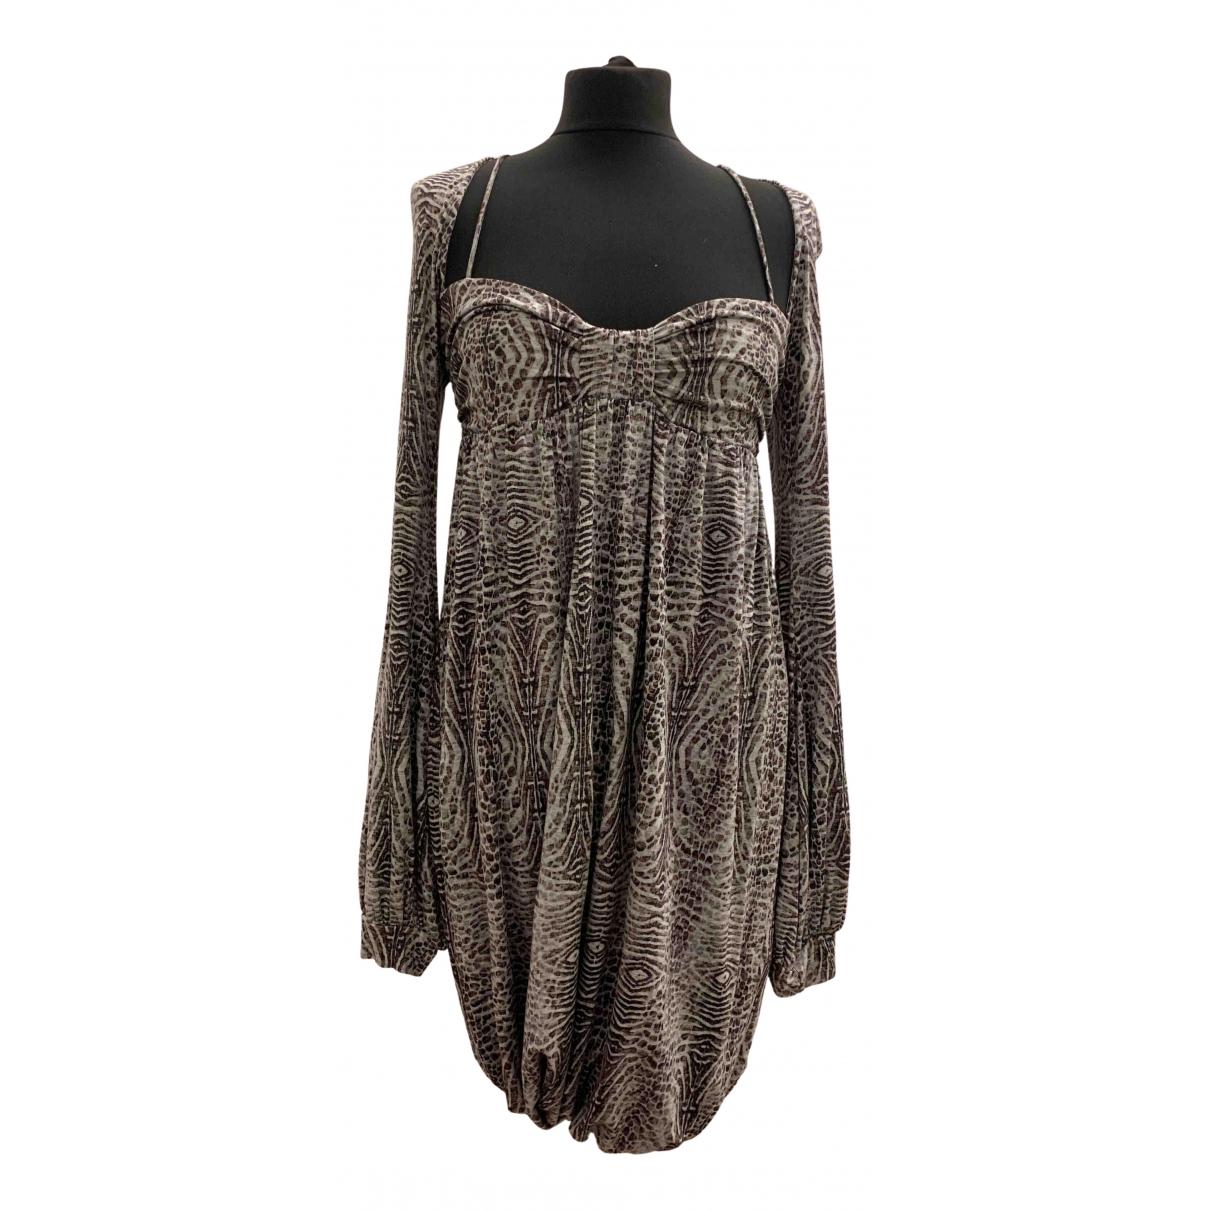 Patrizia Pepe N Purple dress for Women 1 US